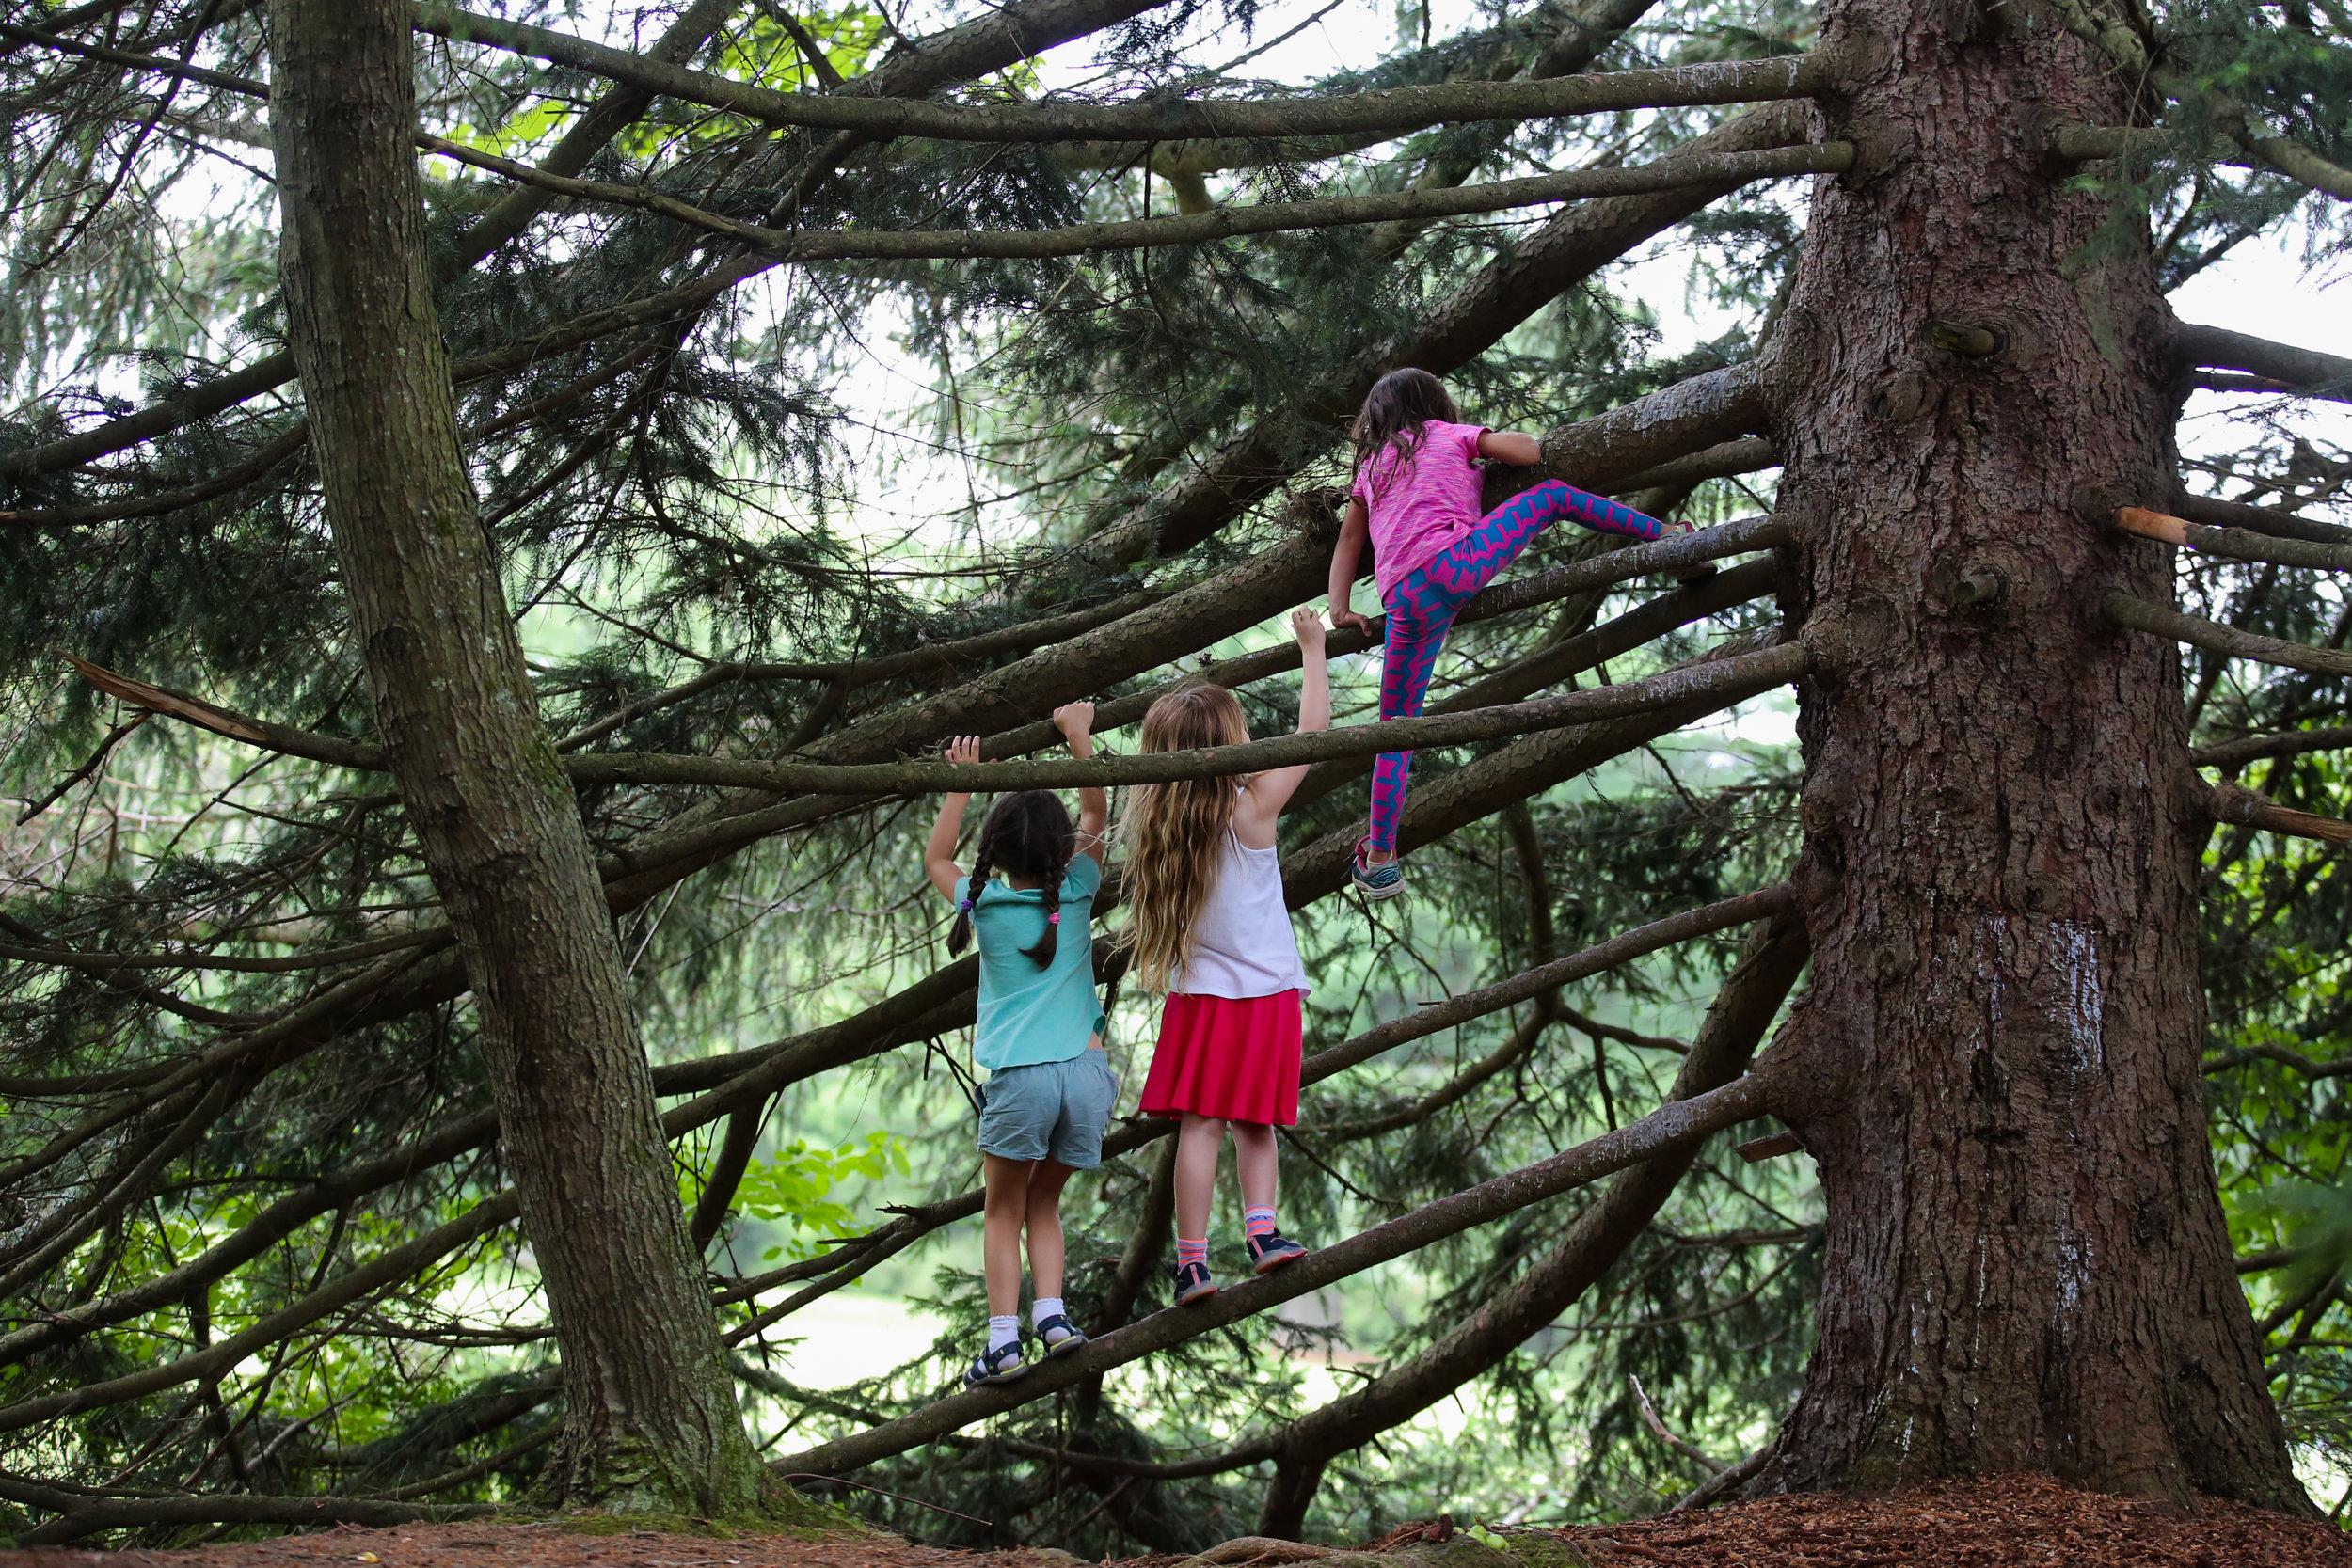 Three girls climb the limbs of a large coniferous tree